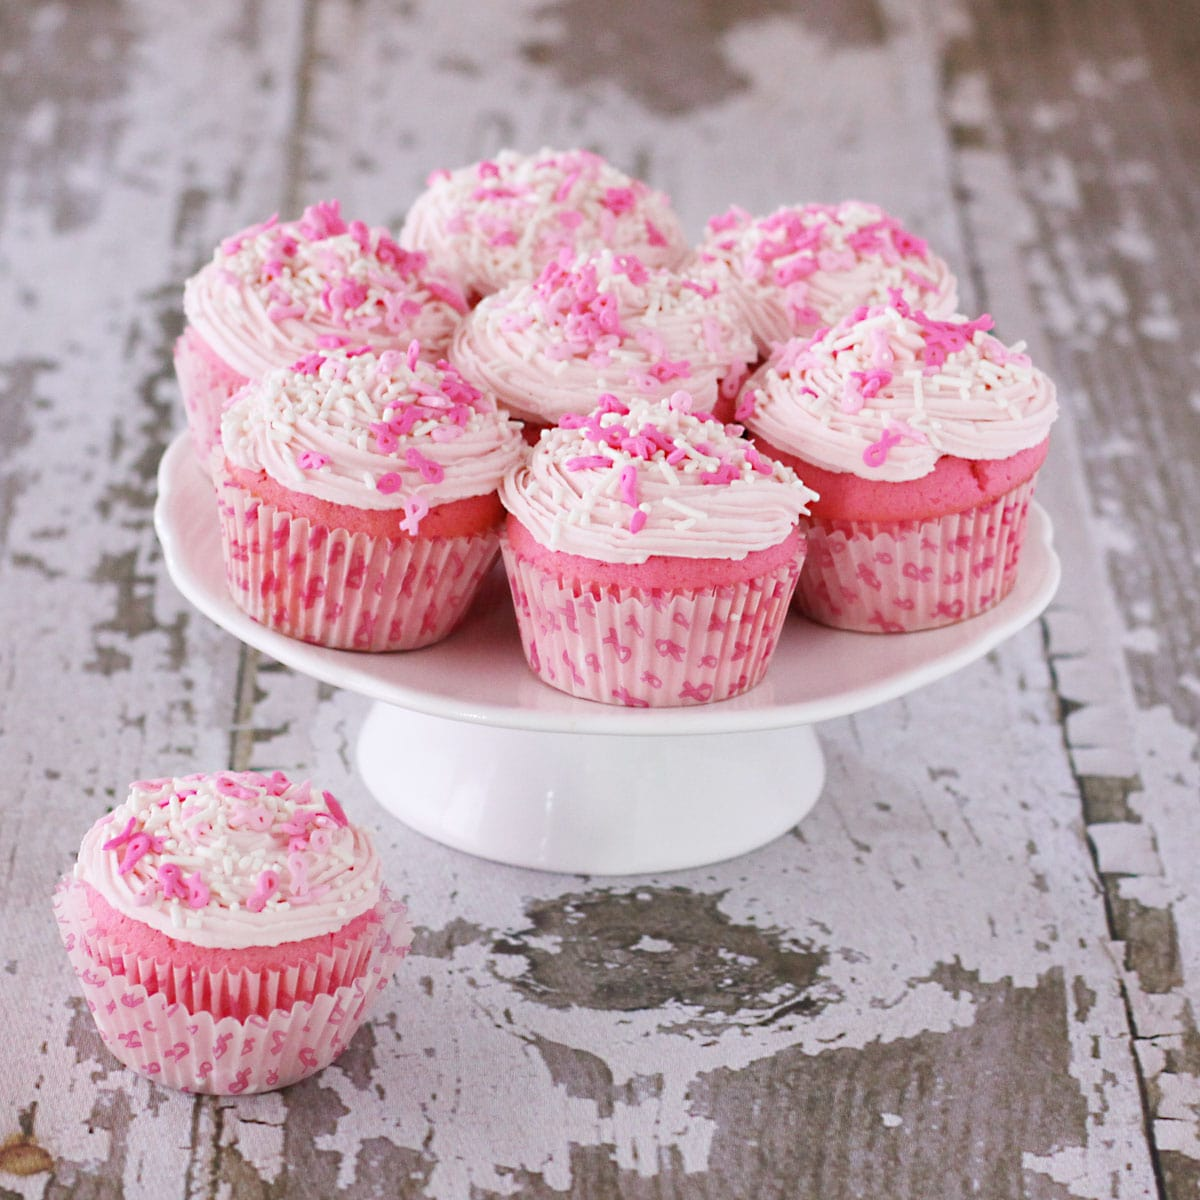 sobremesa-rosa-cha-de-panela-cupcake-03-min